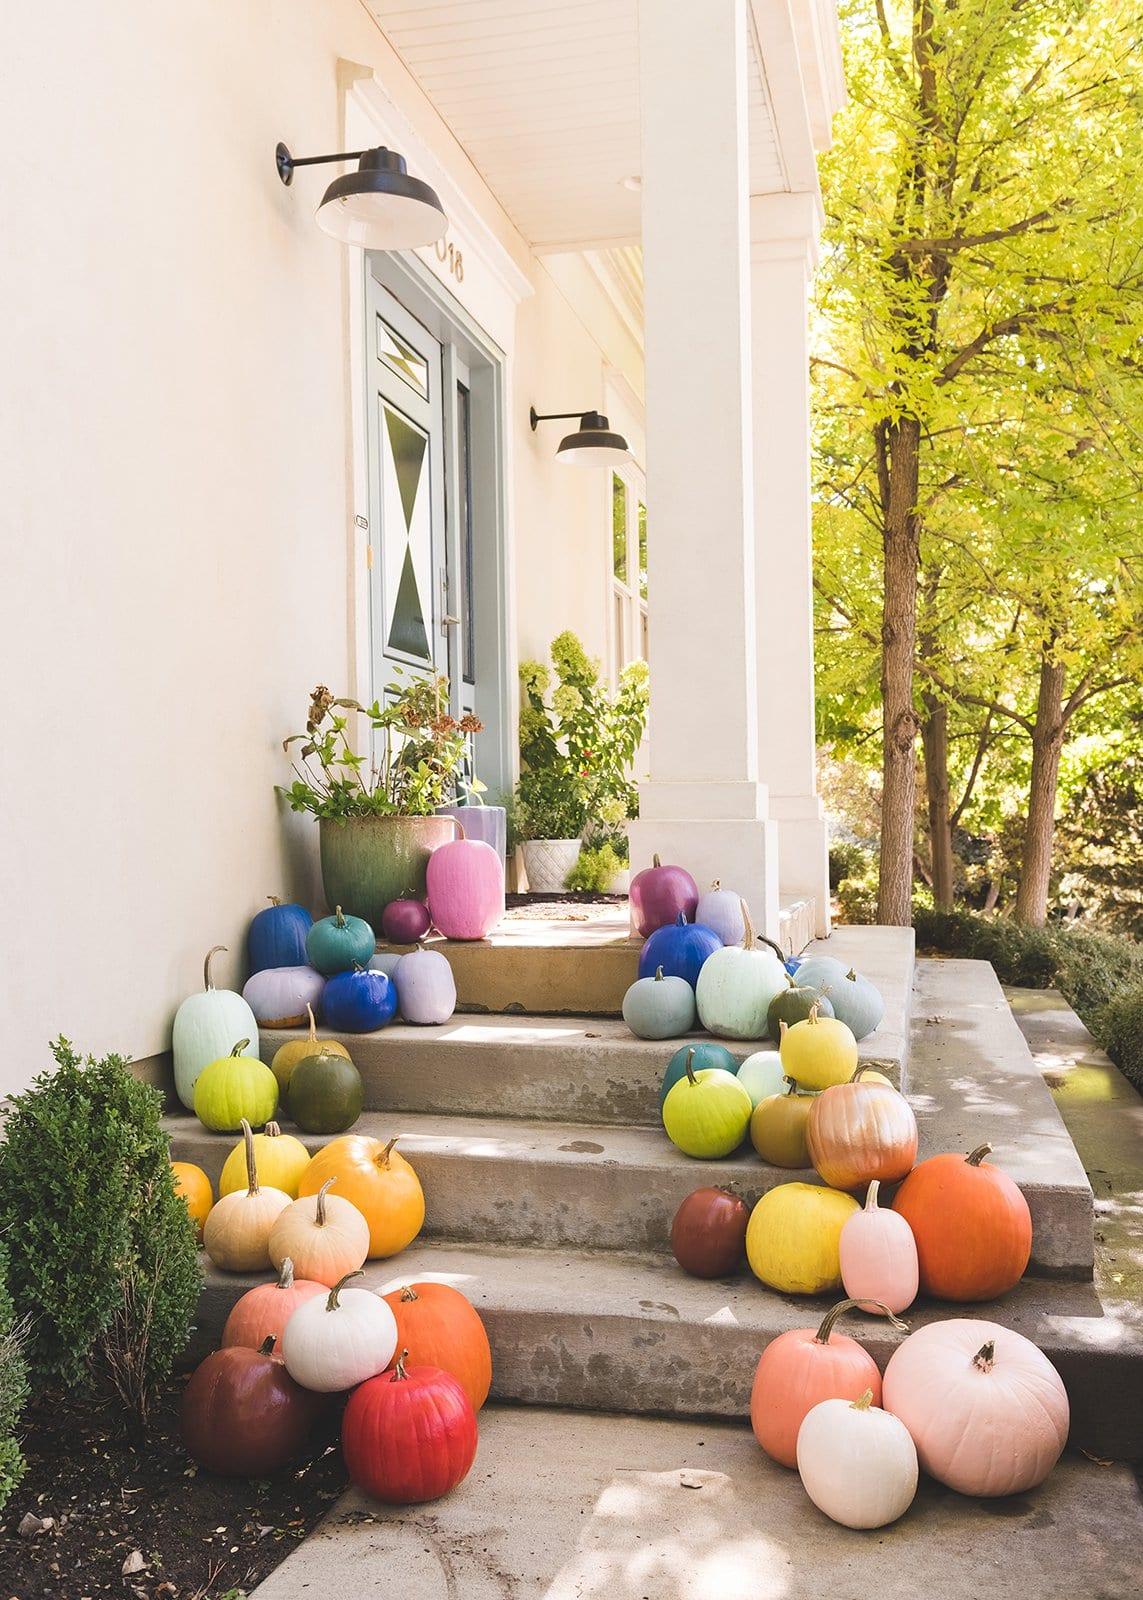 Rainbow pumpkins on the porch